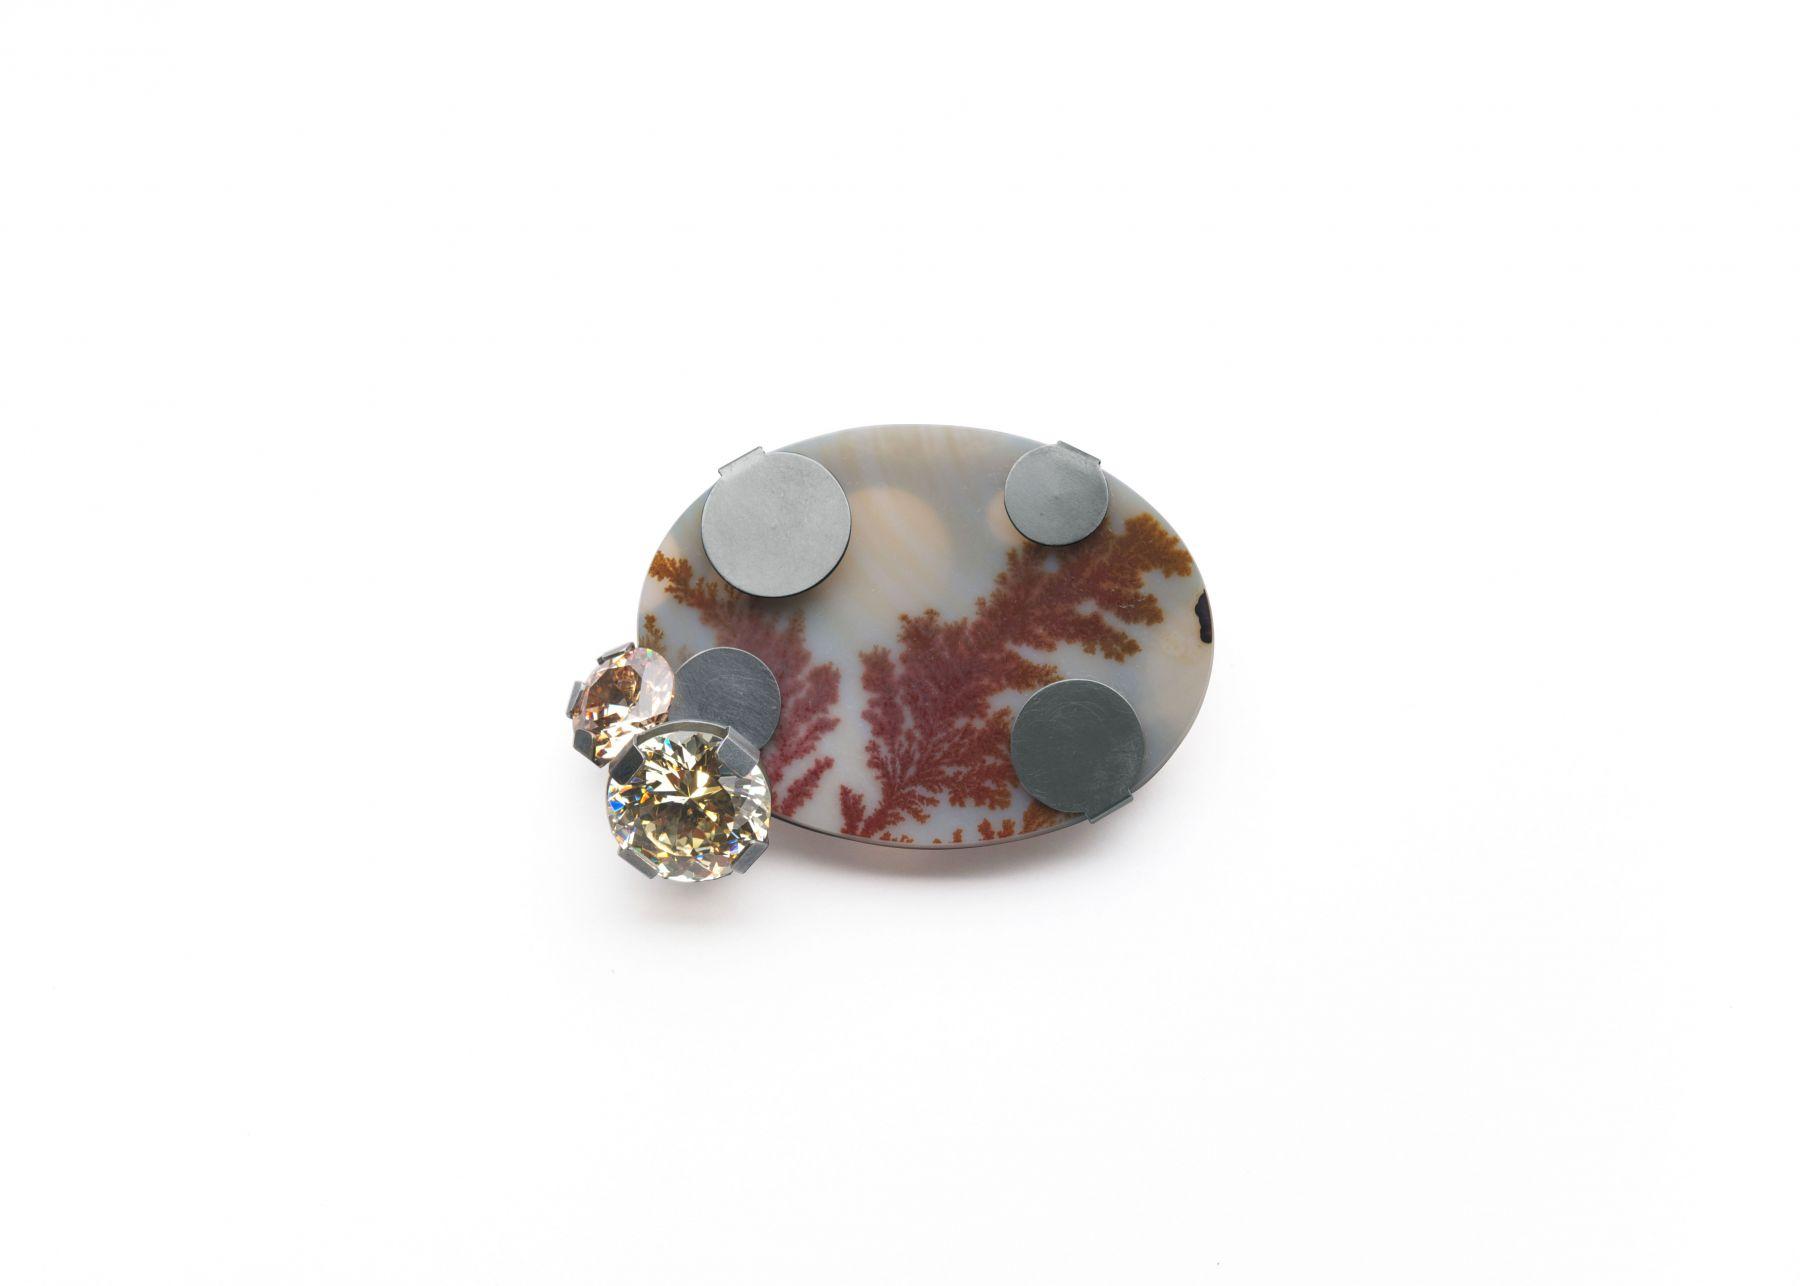 Ute Eitzenhöfer, brooch, stone, silver, German, Contemporary Jewelry